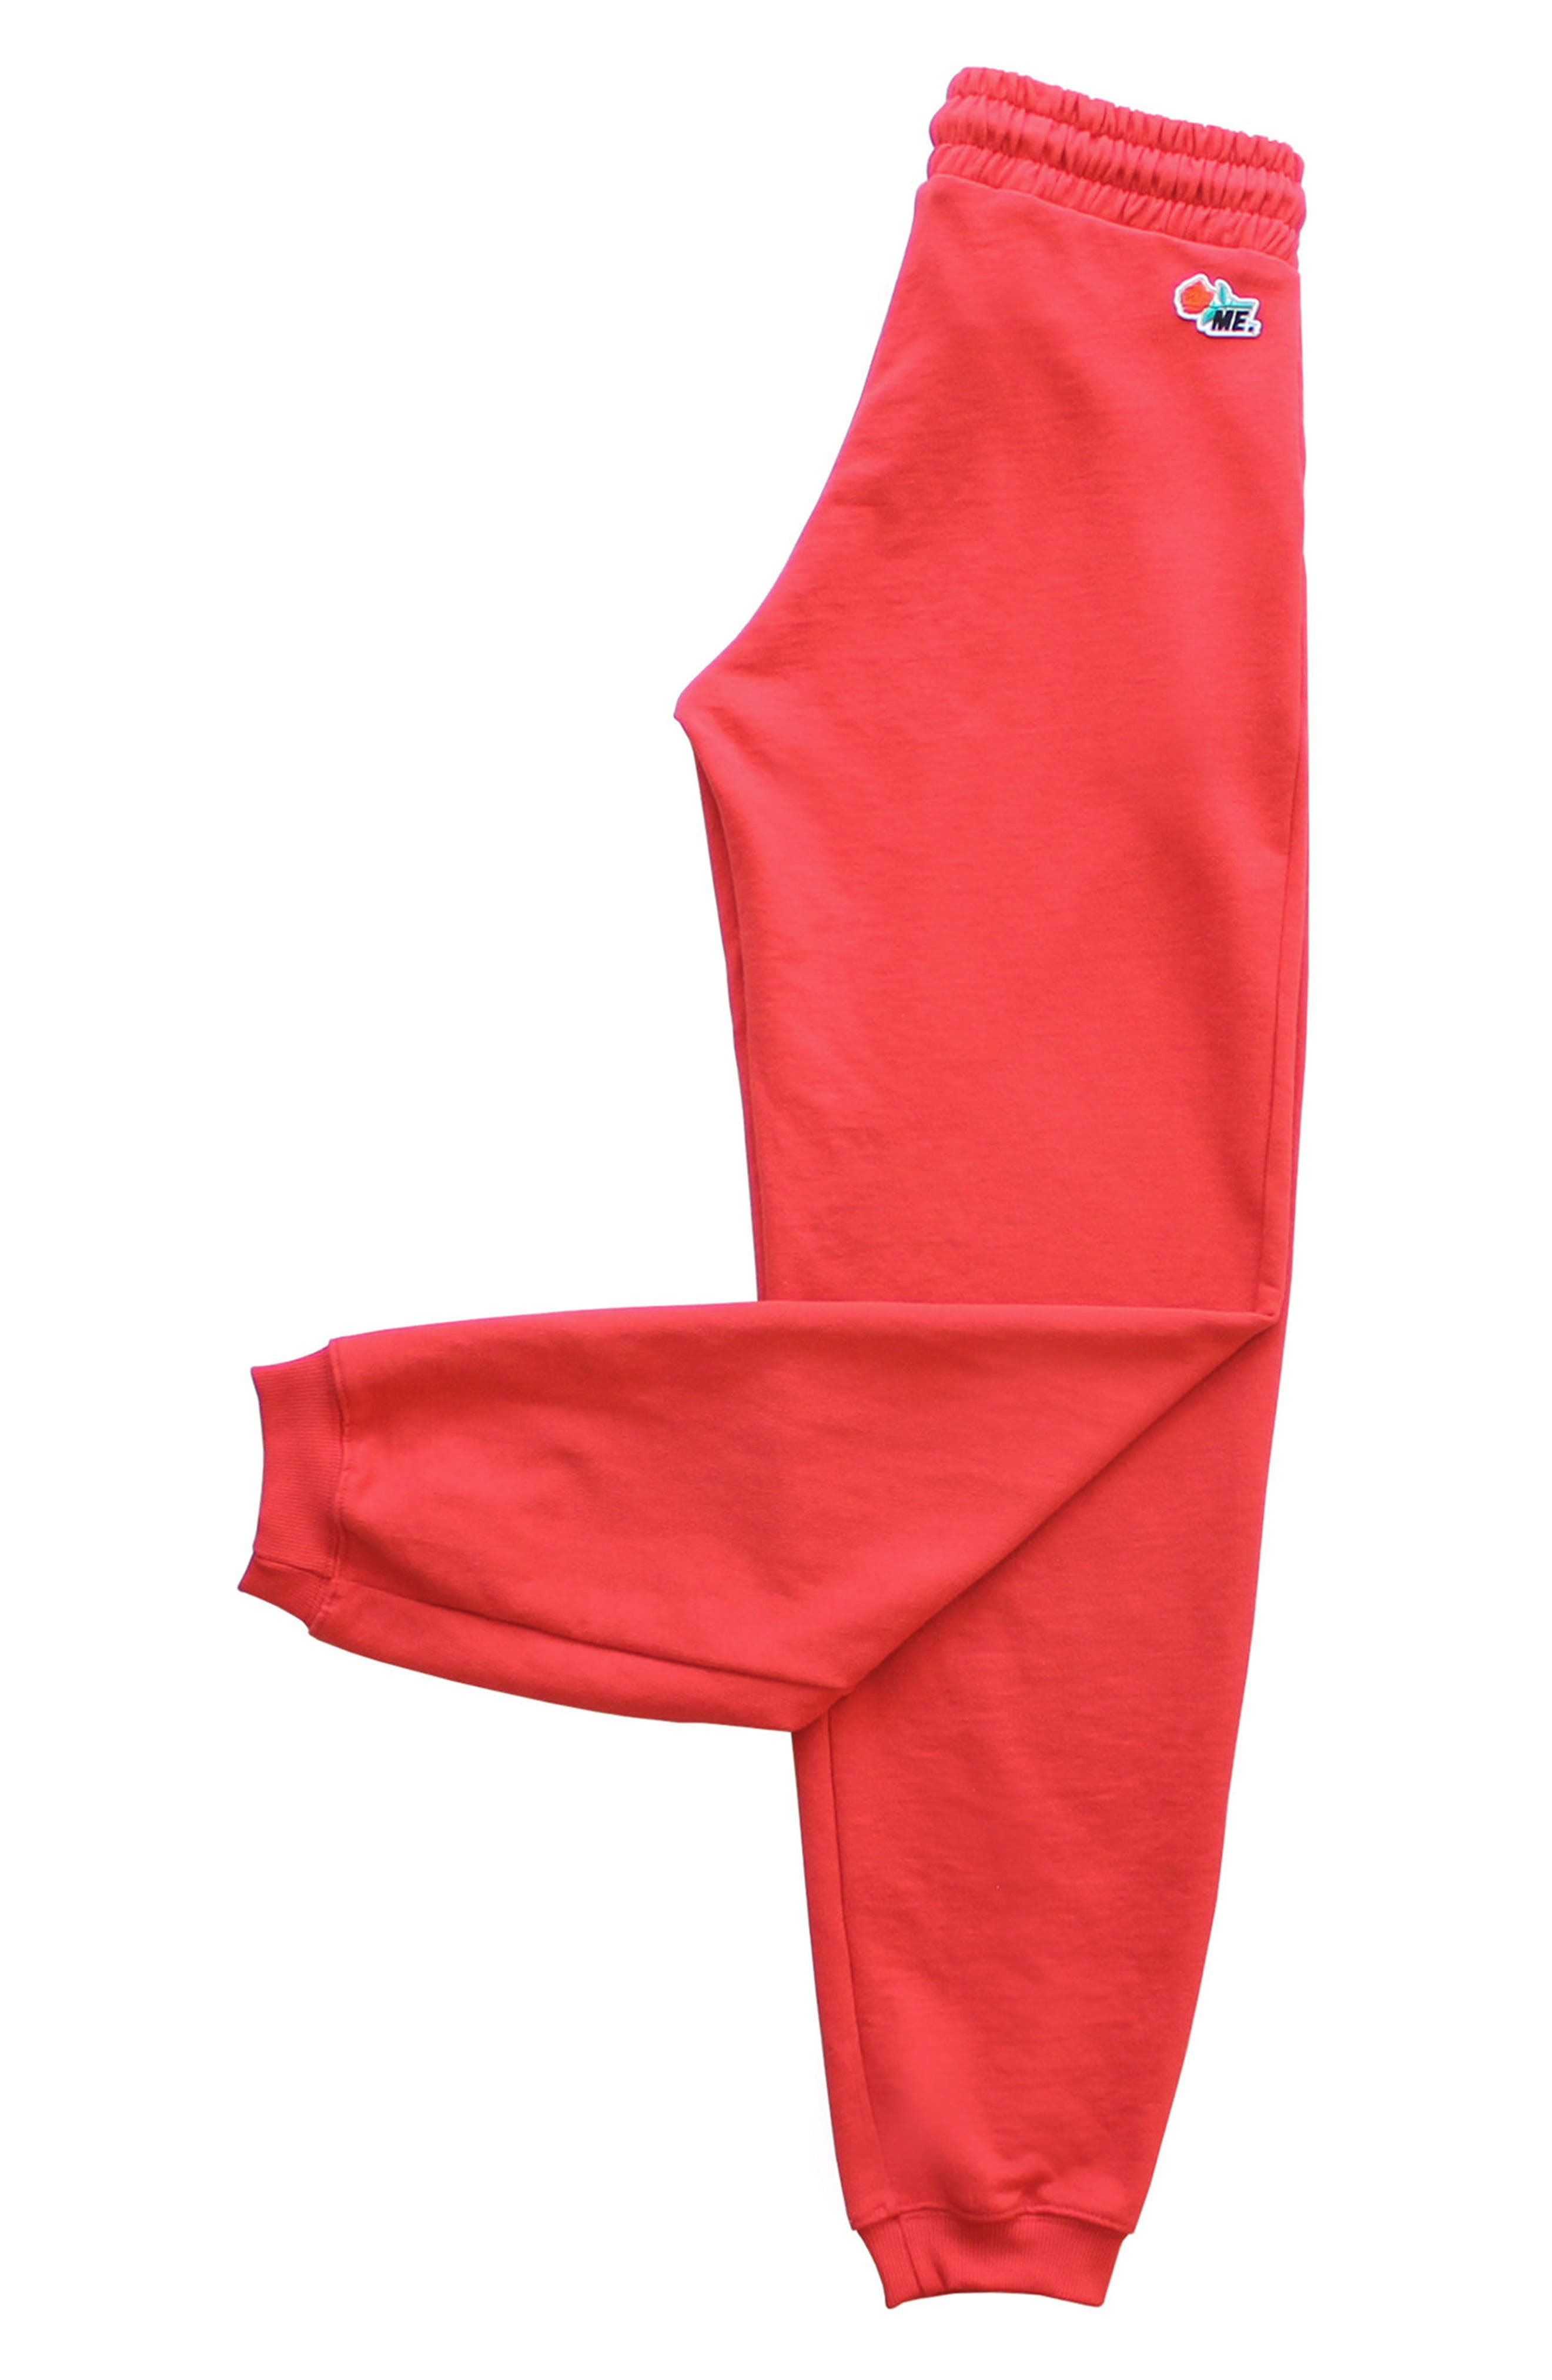 ME. Rose Sweatpants,                             Alternate thumbnail 8, color,                             CHERRY RED